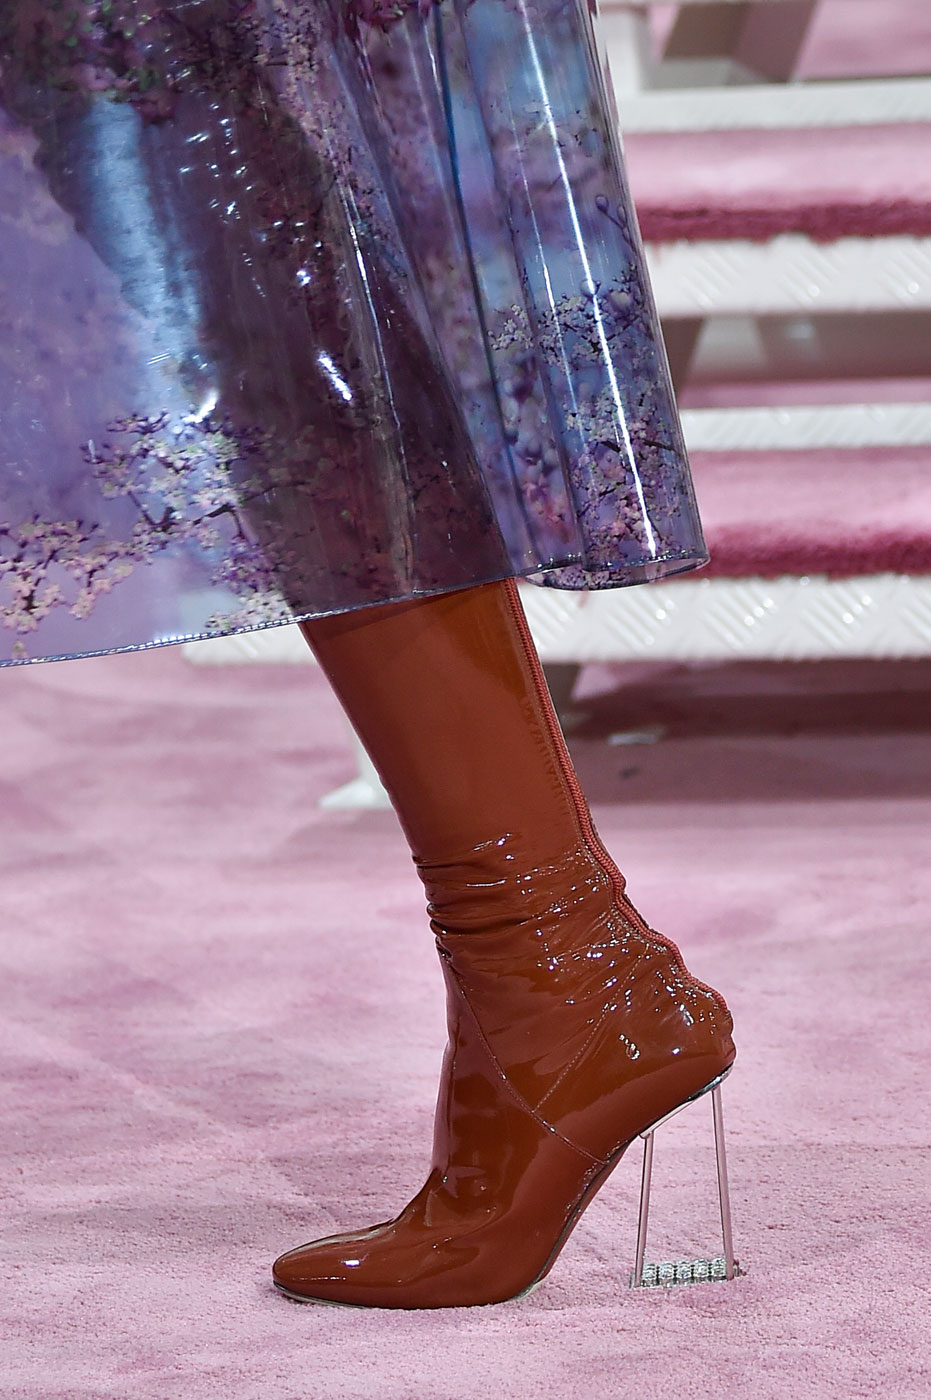 Christian-Dior-fashion-runway-show-close-ups-haute-couture-paris-spring-summer-2015-the-impression-070